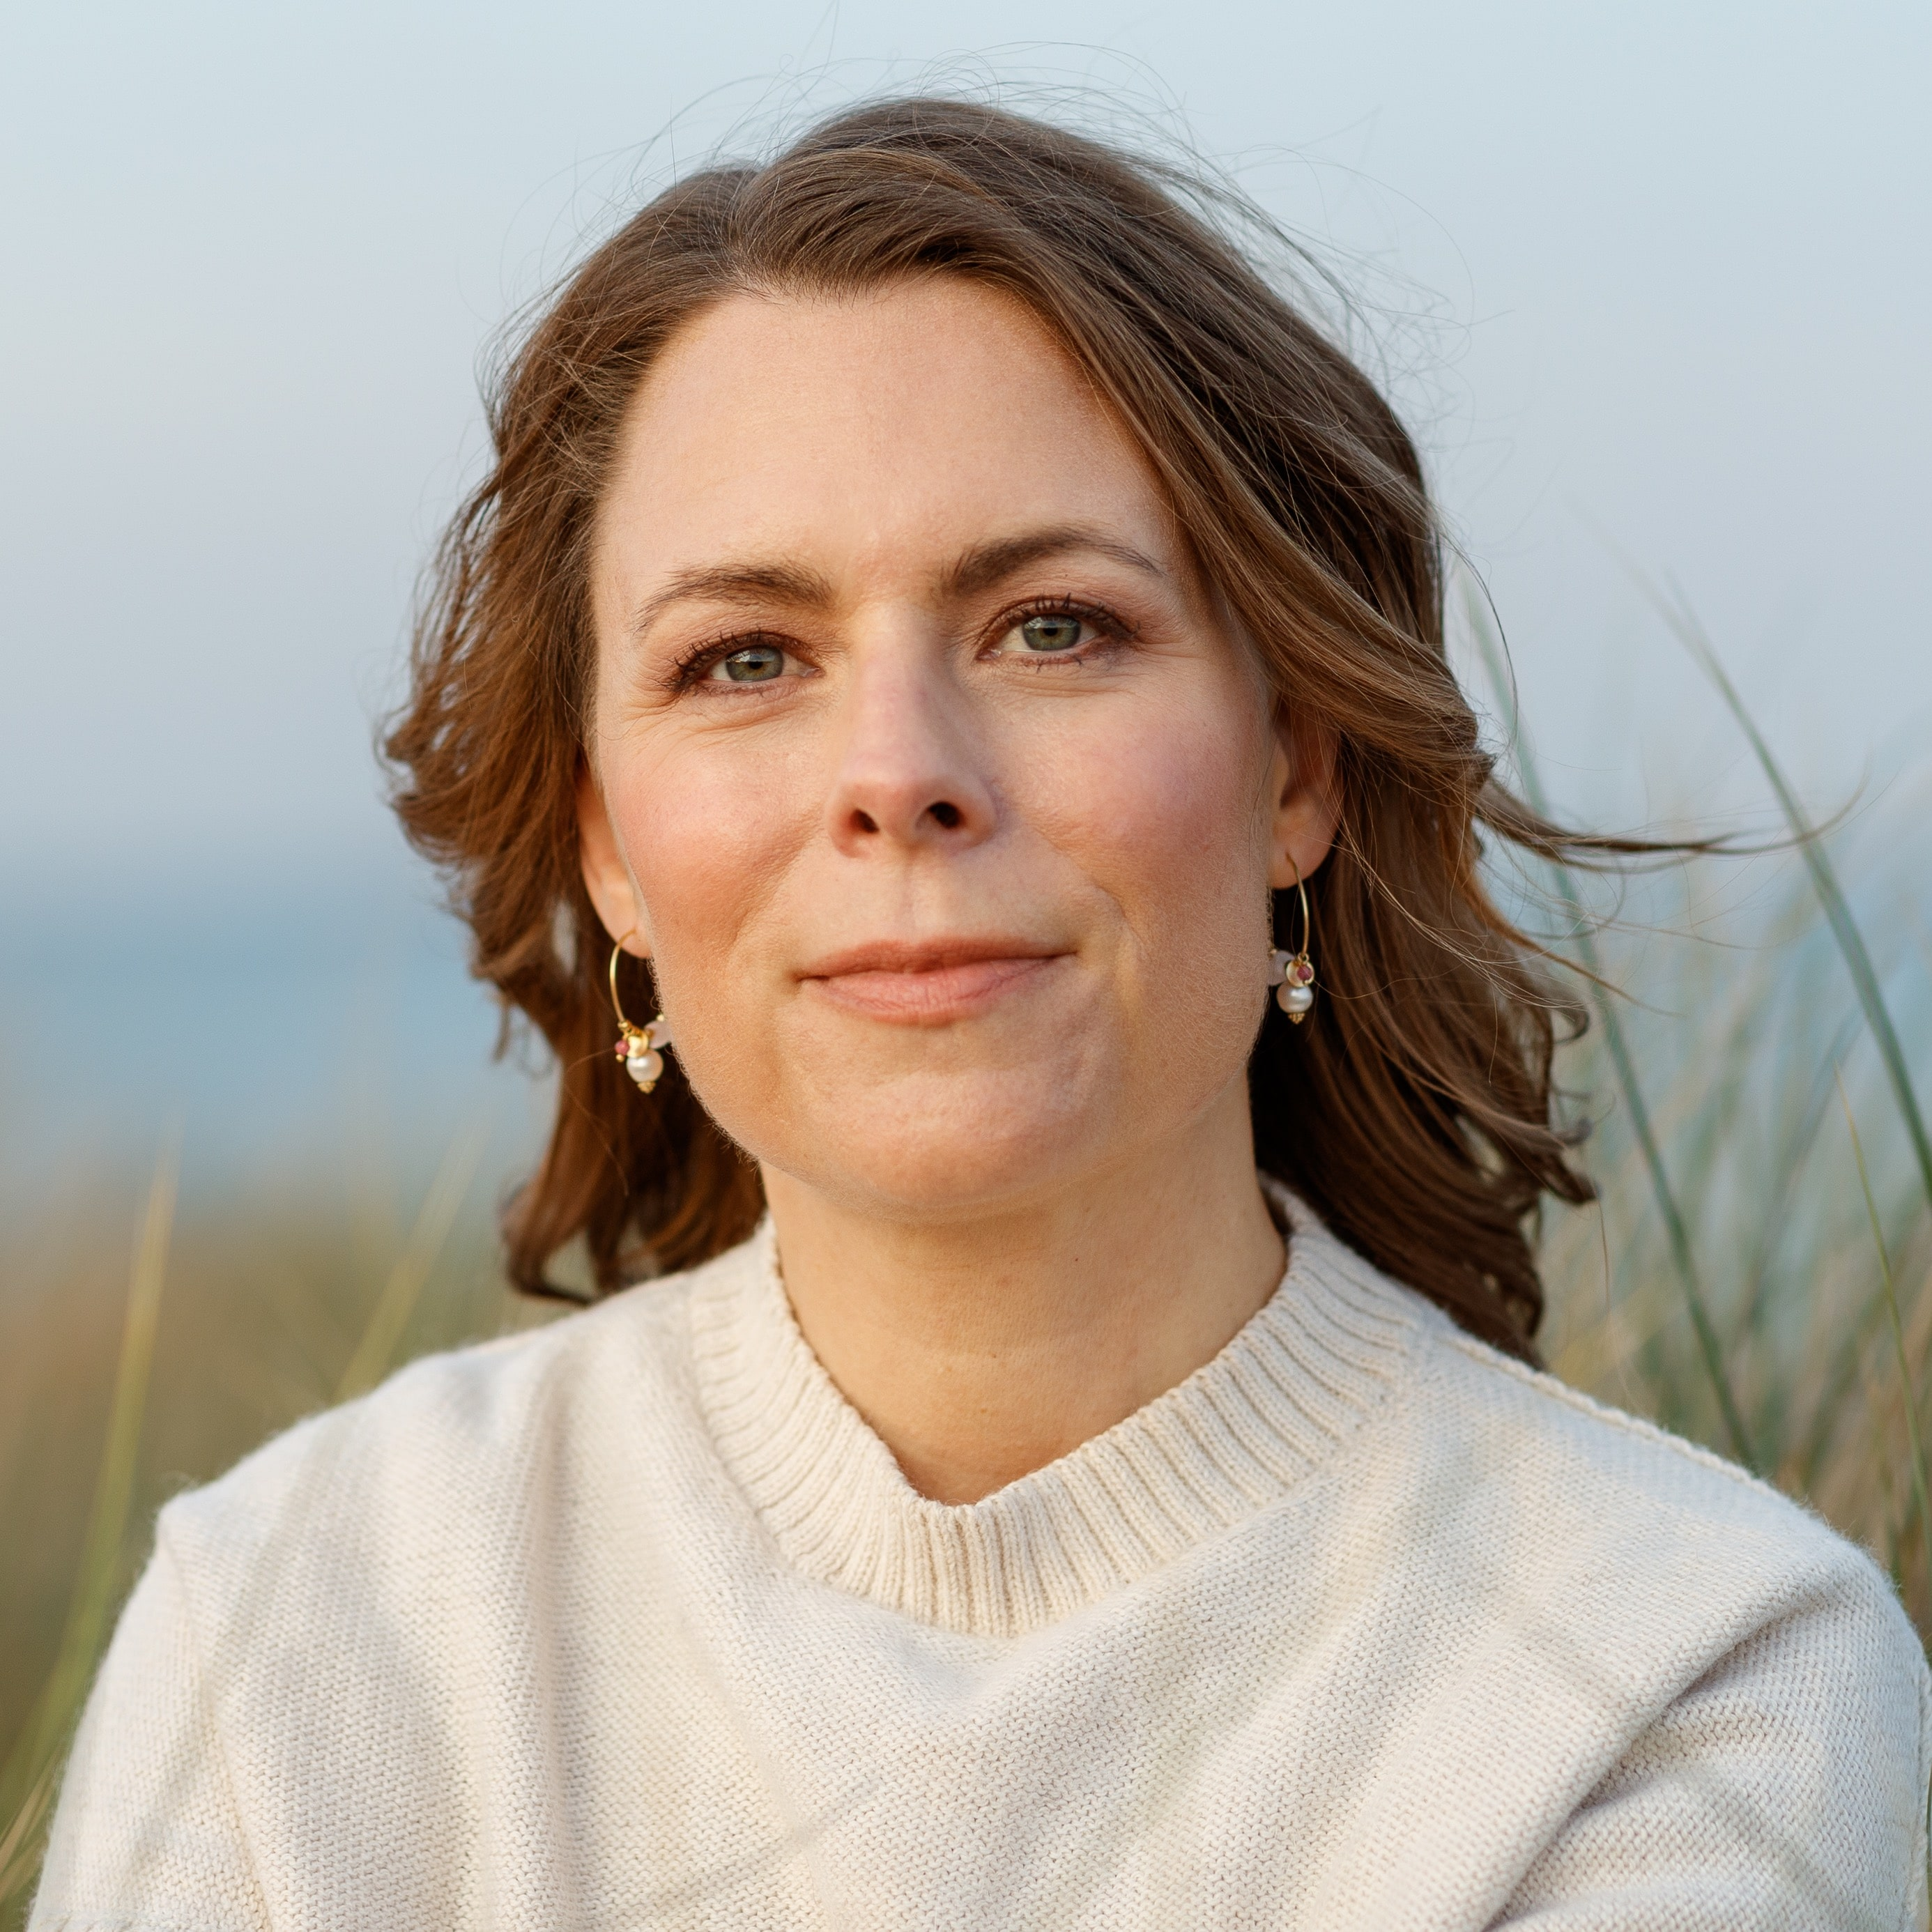 Teresa Thaning portræt